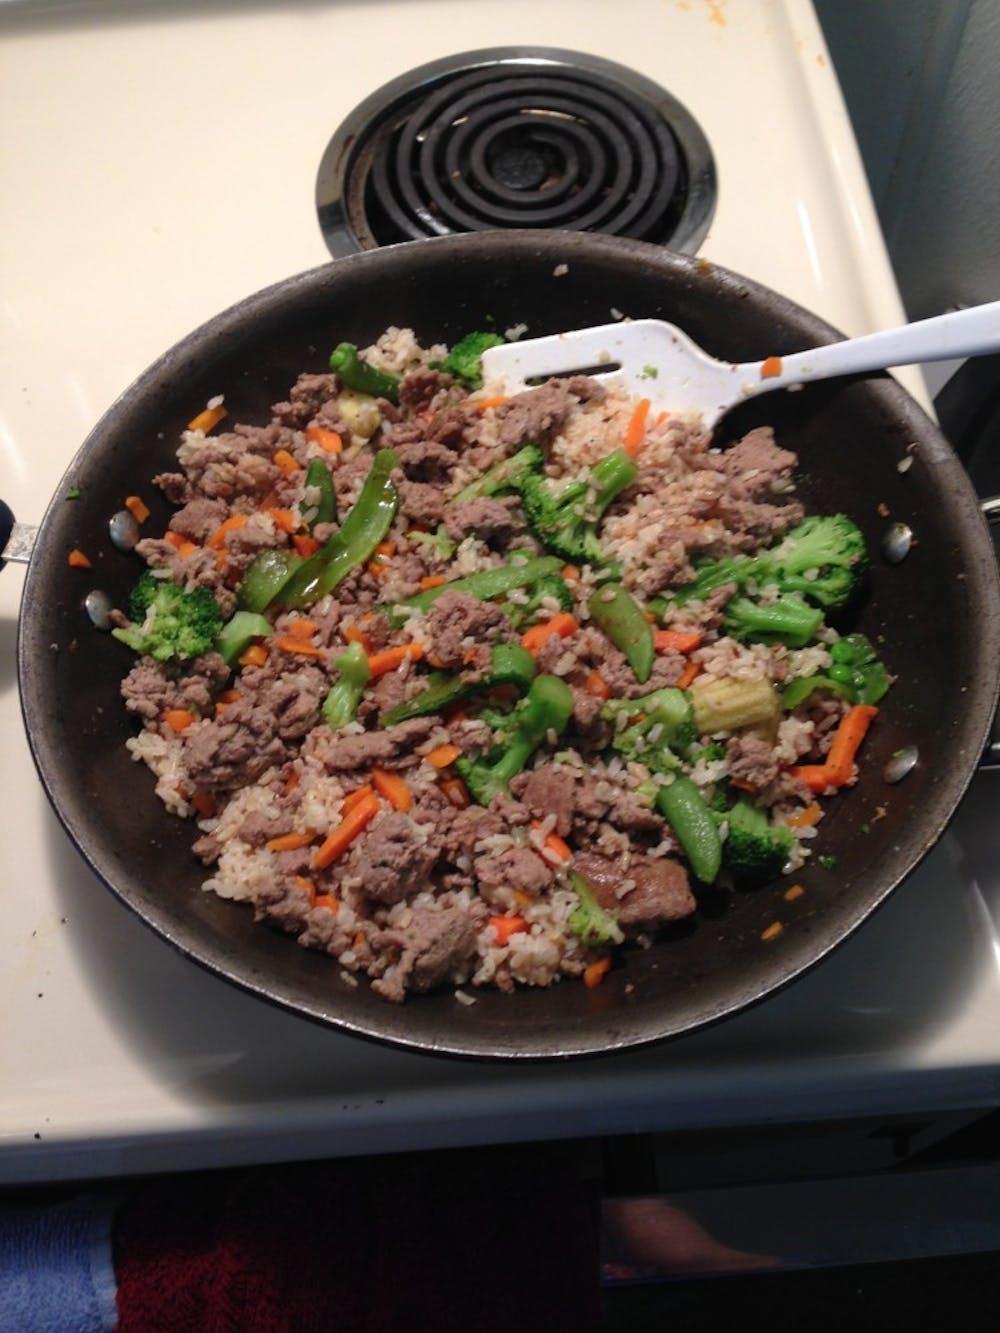 Recipe of the Week: Turkey Stir Fry